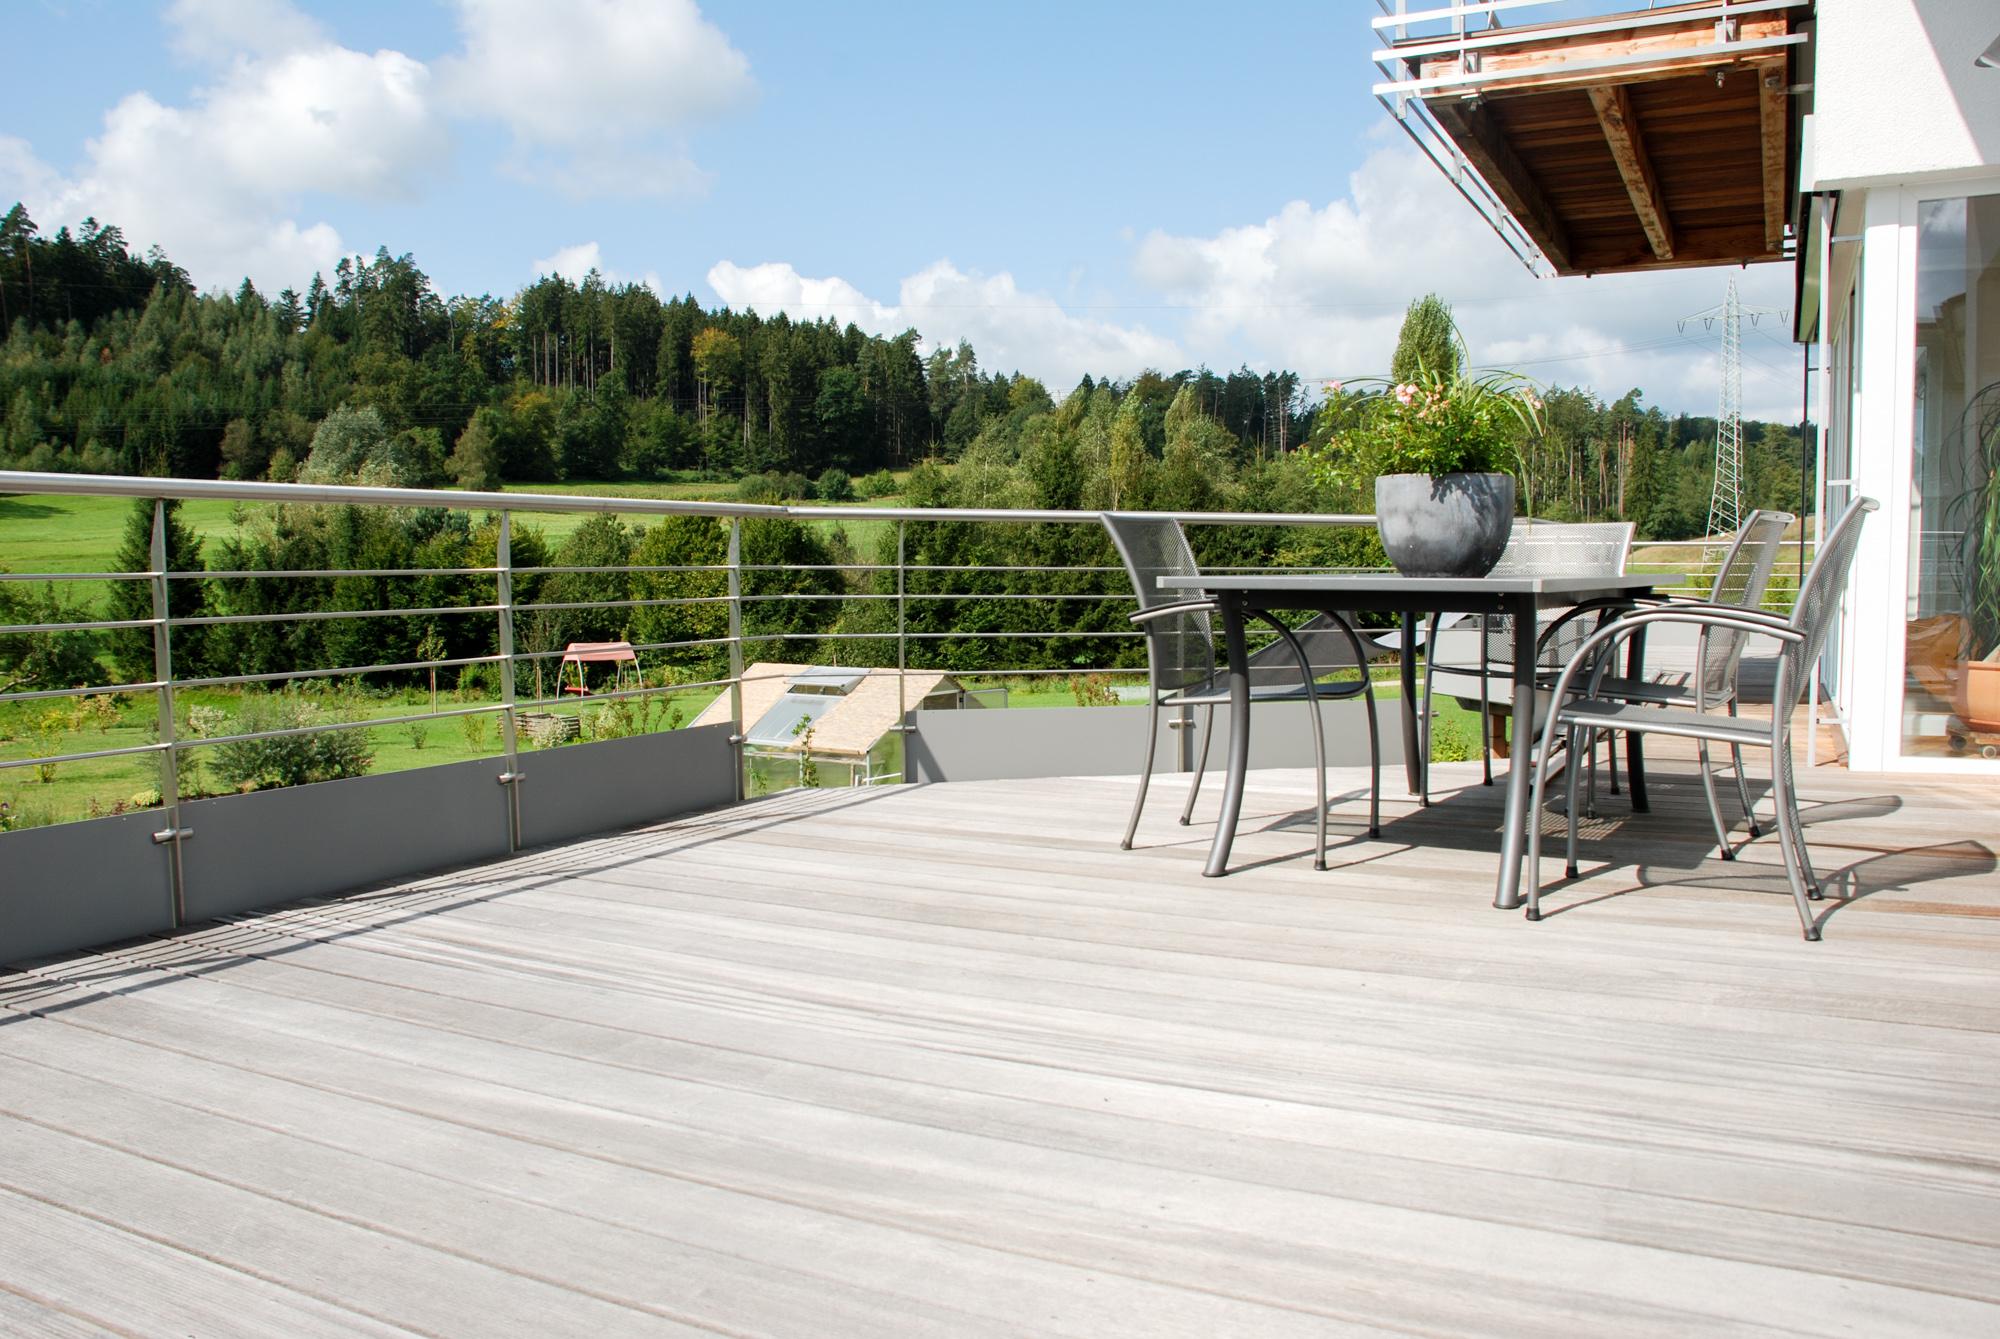 carports und holzterrassen holzbau mayle. Black Bedroom Furniture Sets. Home Design Ideas